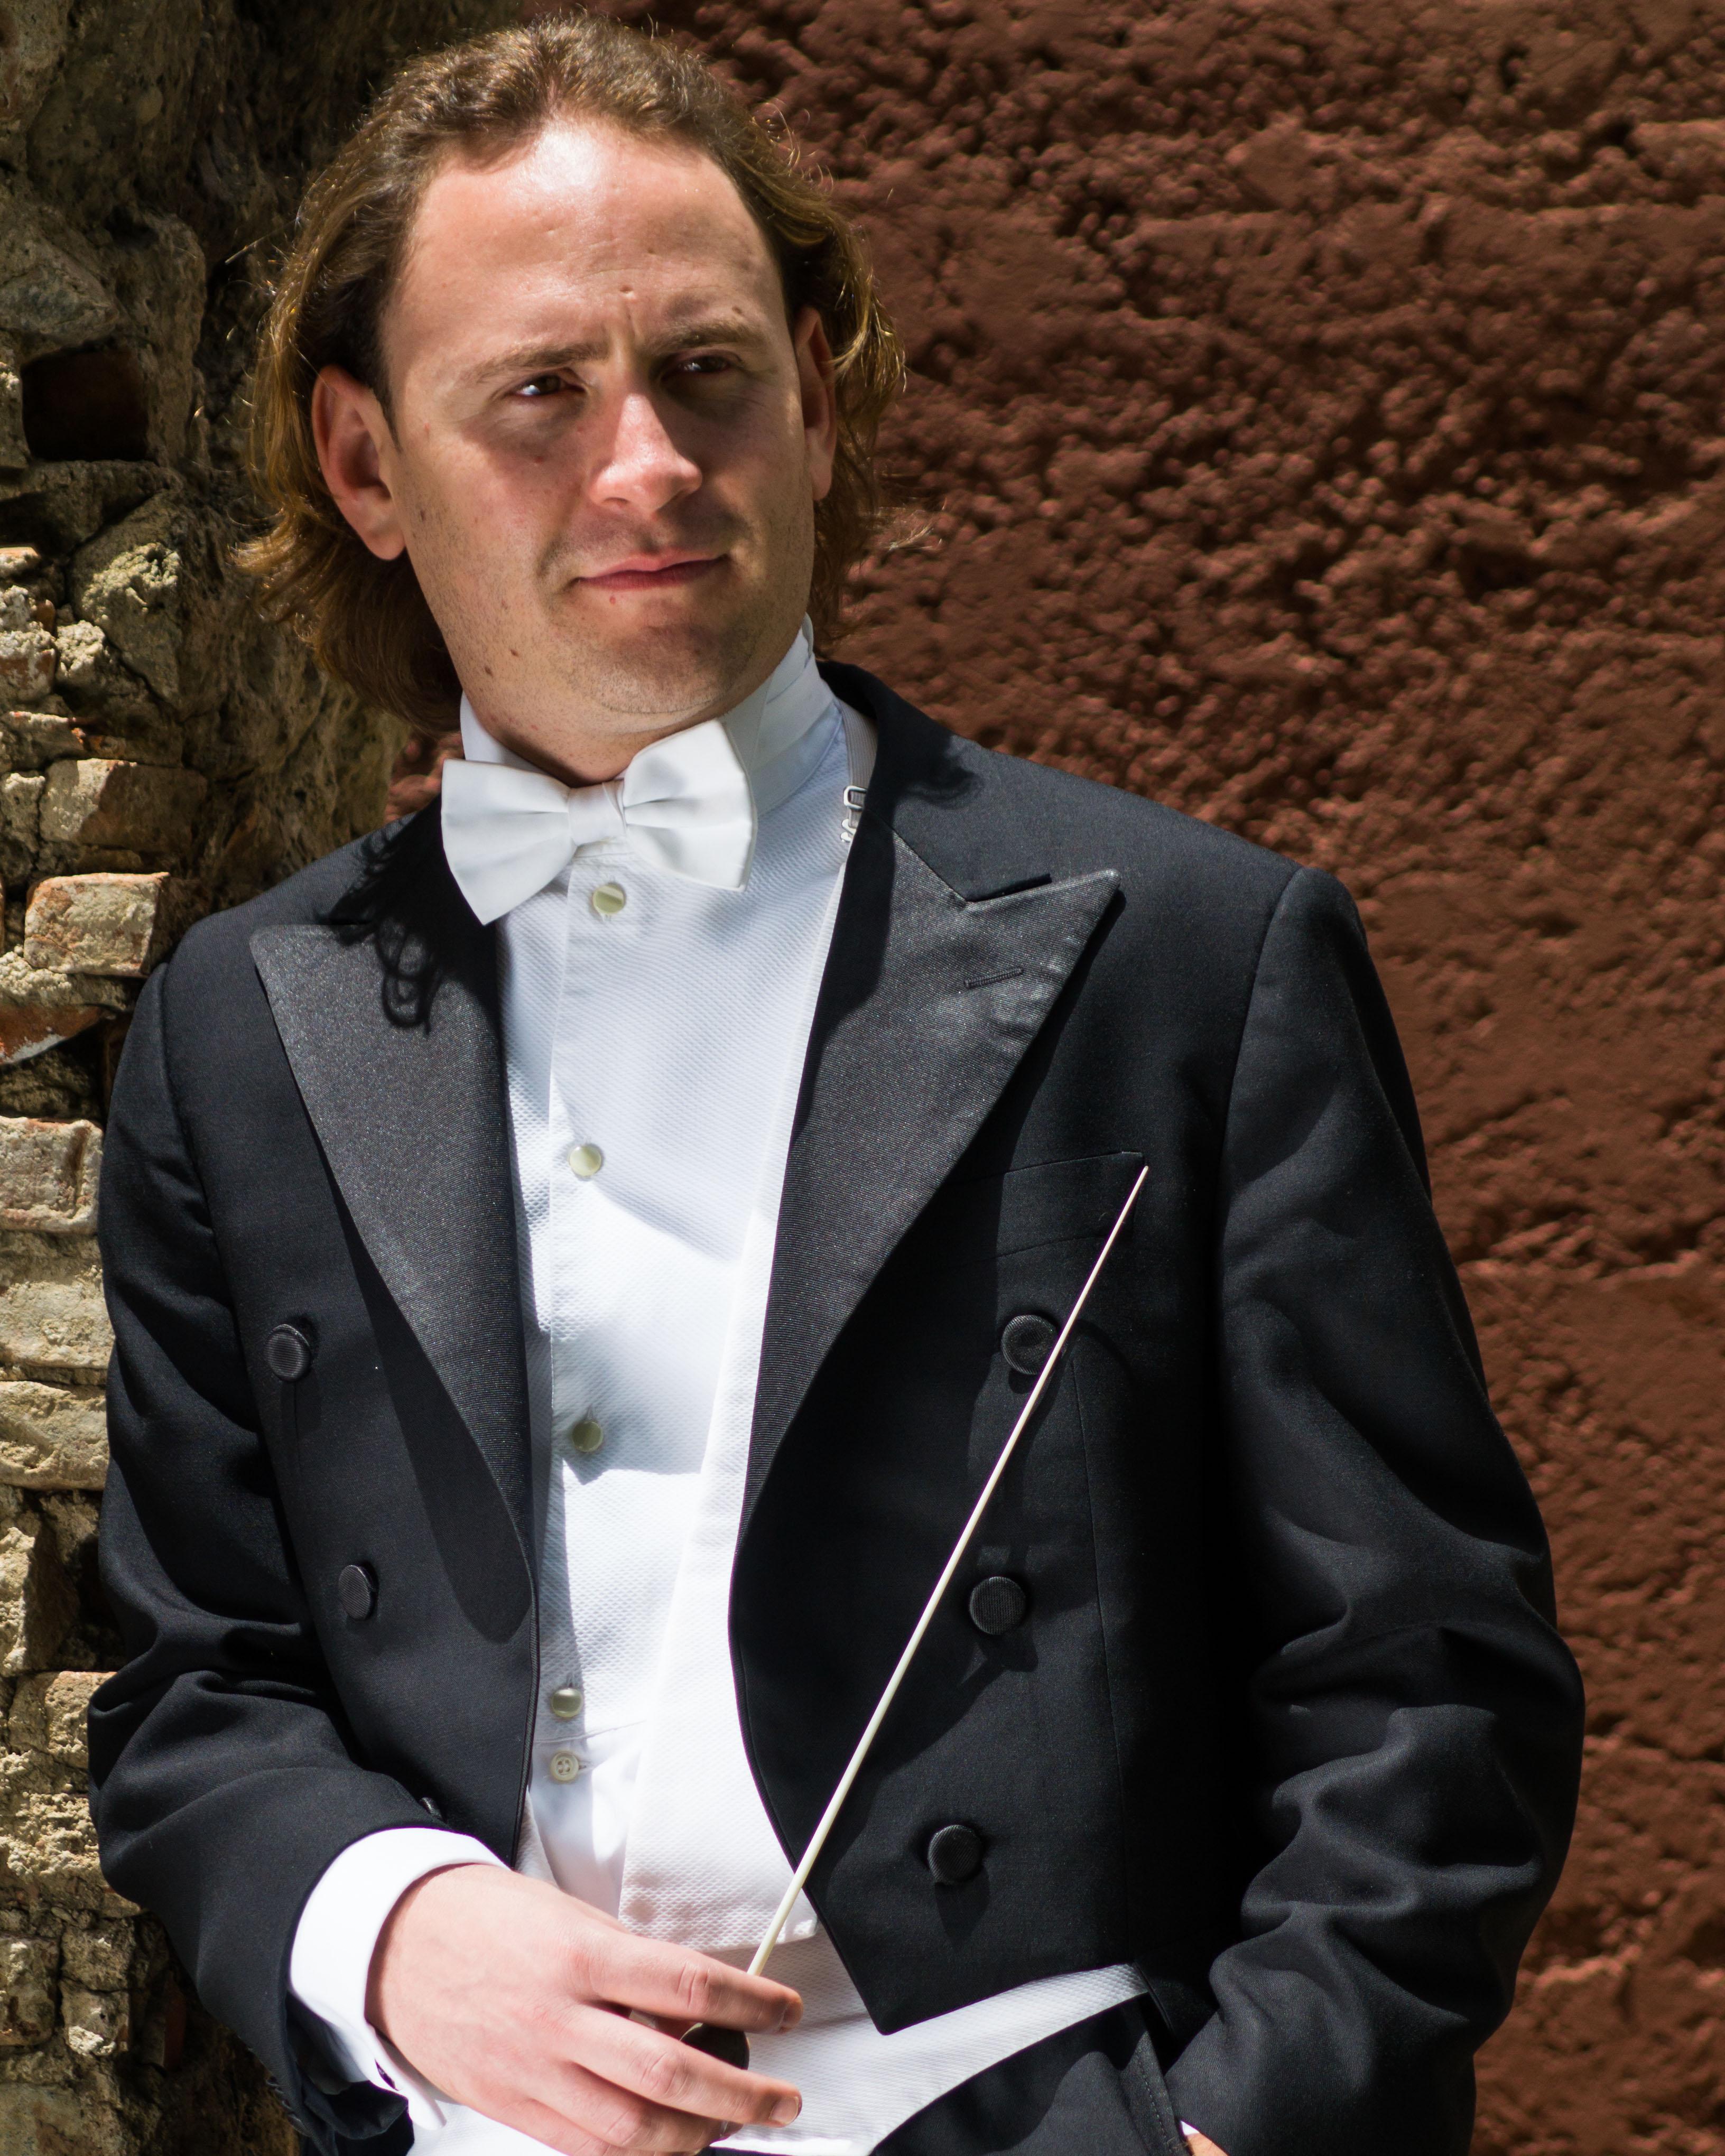 Image of Christian Vásquez